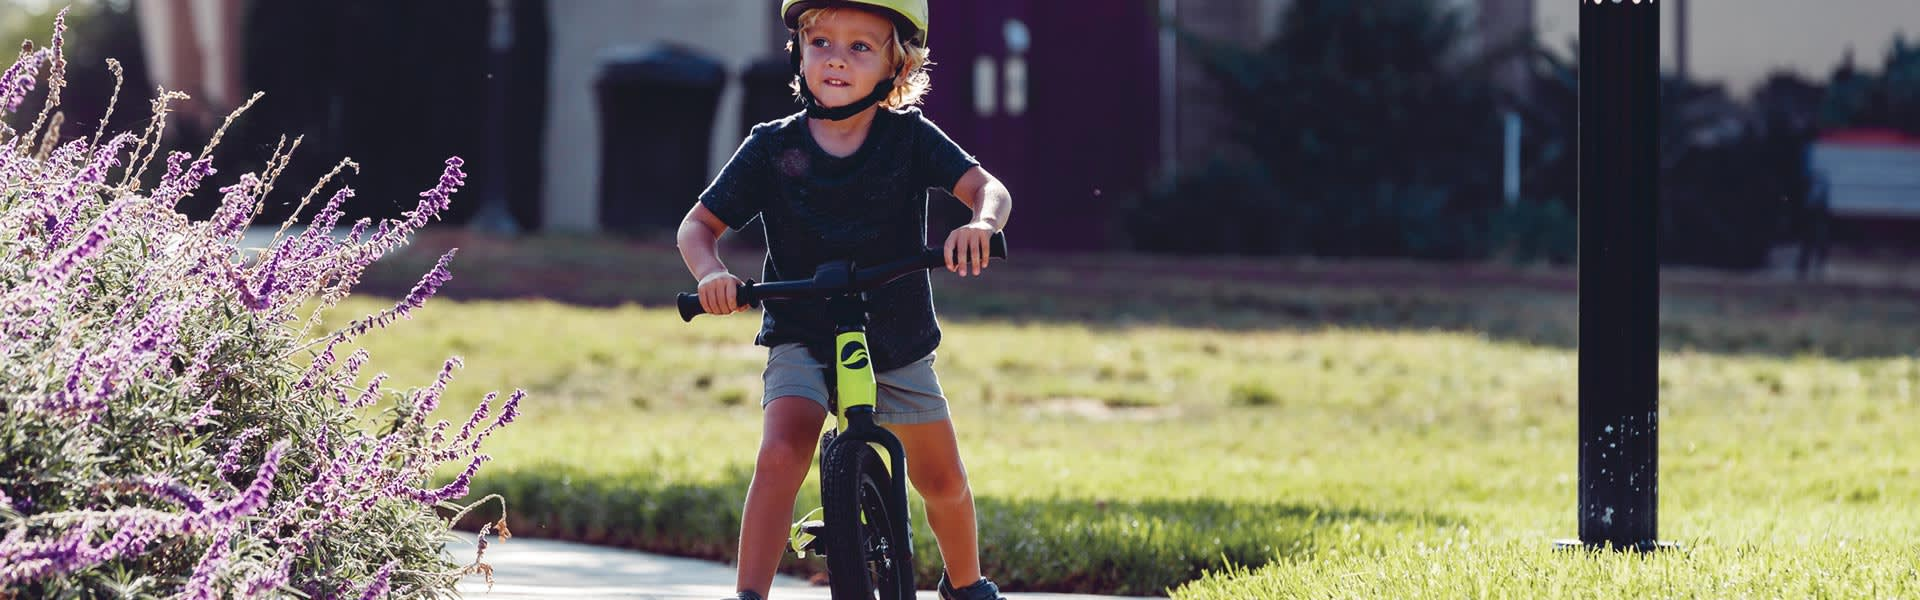 Kids' Push Bikes